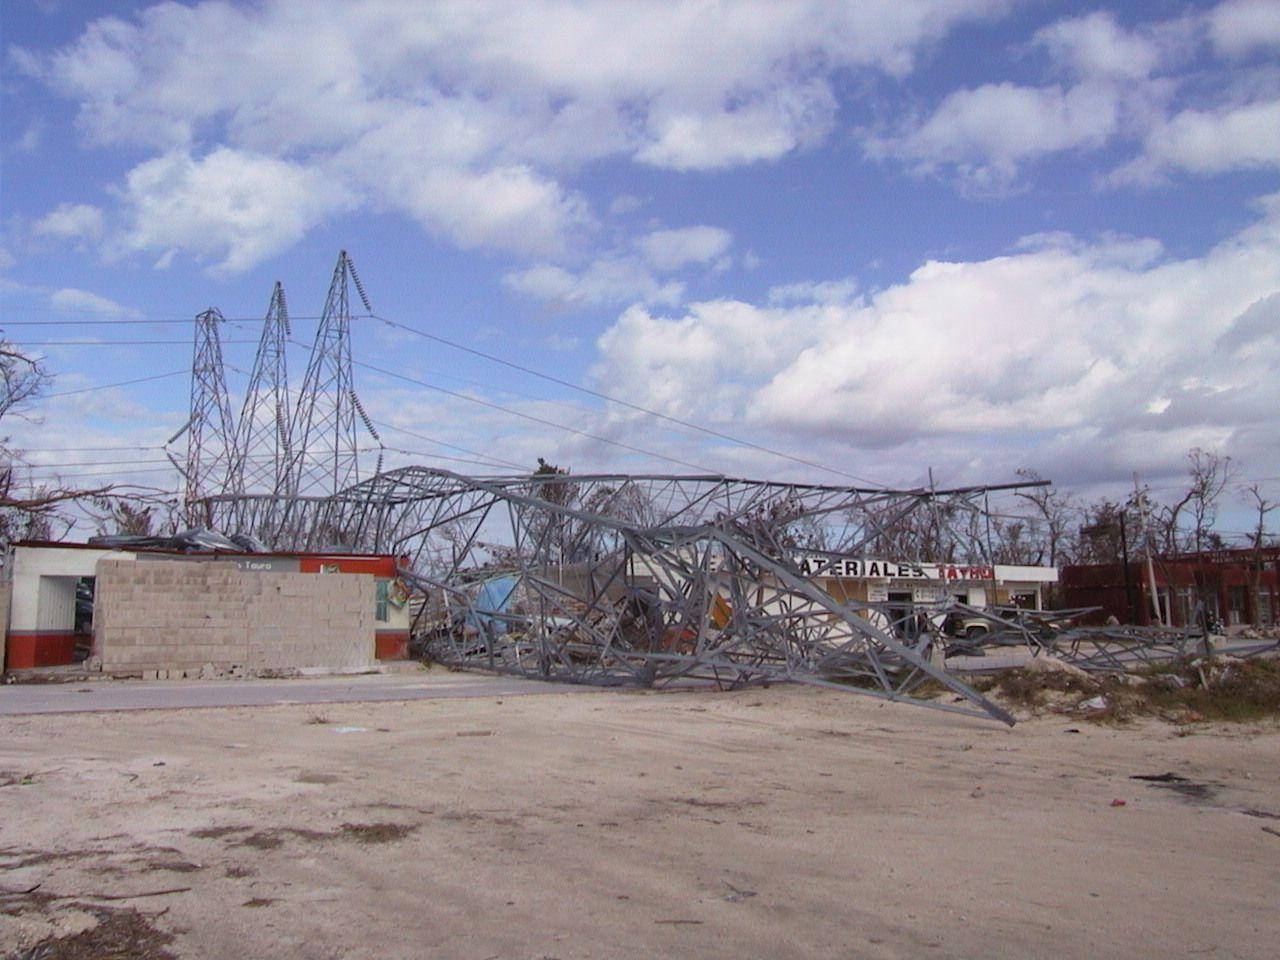 2005 Hurricane Wilma Riviera Maya Resorts Puerto Morelos Riviera Maya